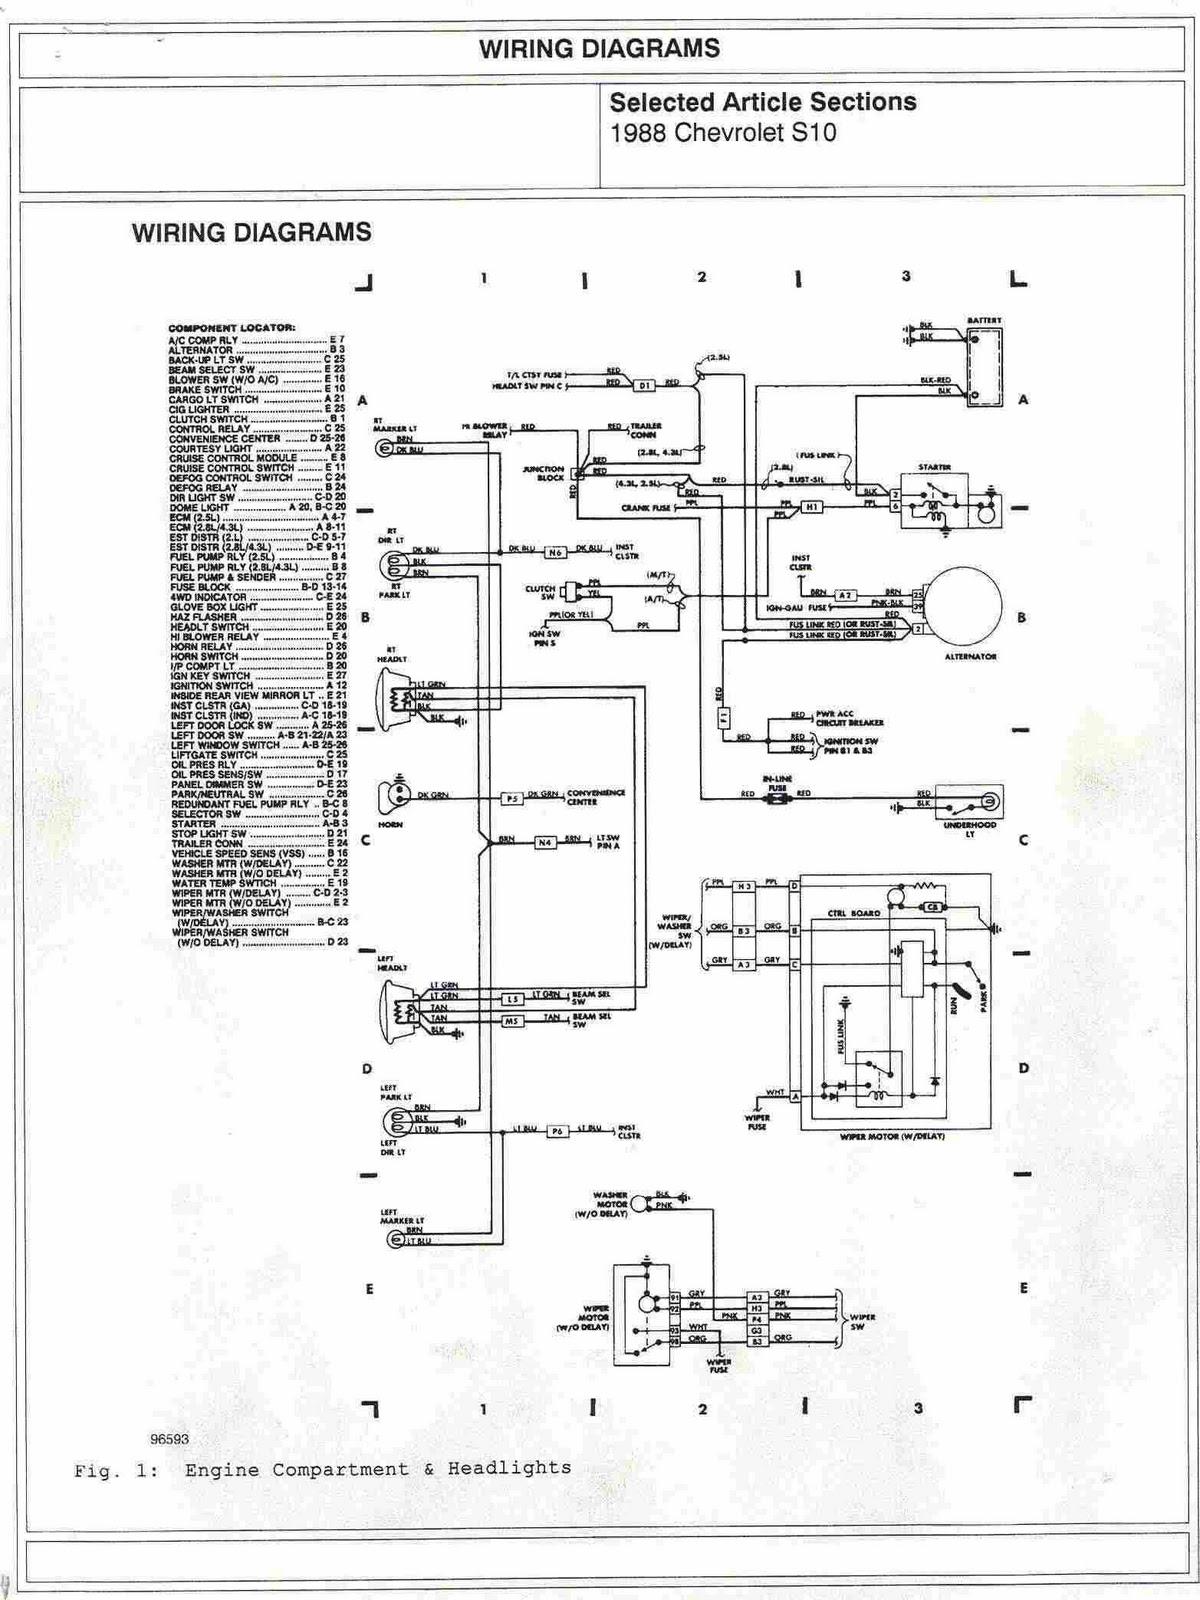 2001 s10 brake light wiring diagram: brake light wiring diagram 95  s10rh:svlc